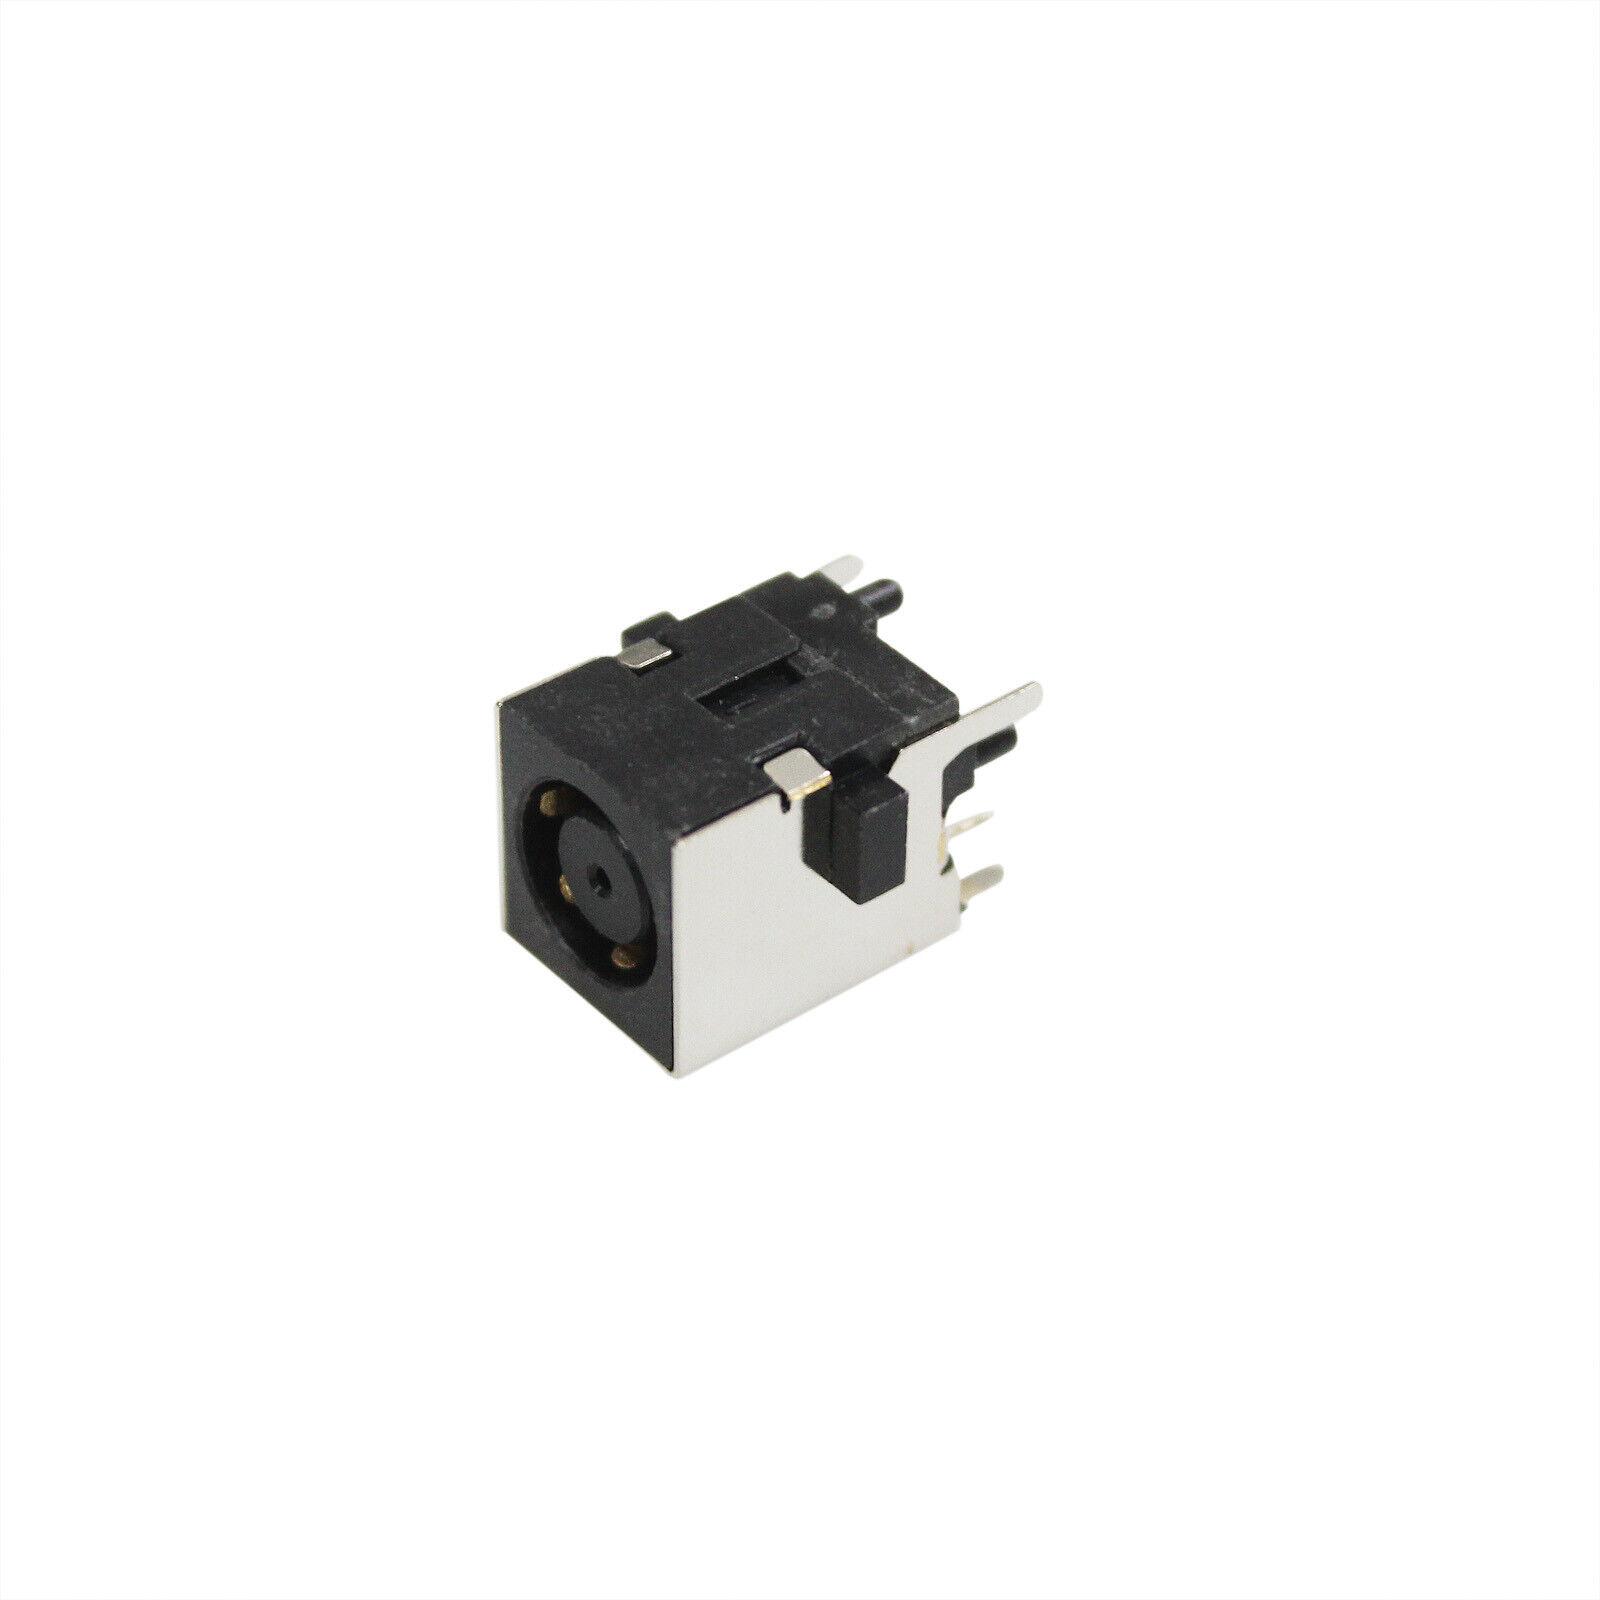 DMX 3458 New Lucent 408682615 Filter for DMX Metropolis Multiplexer